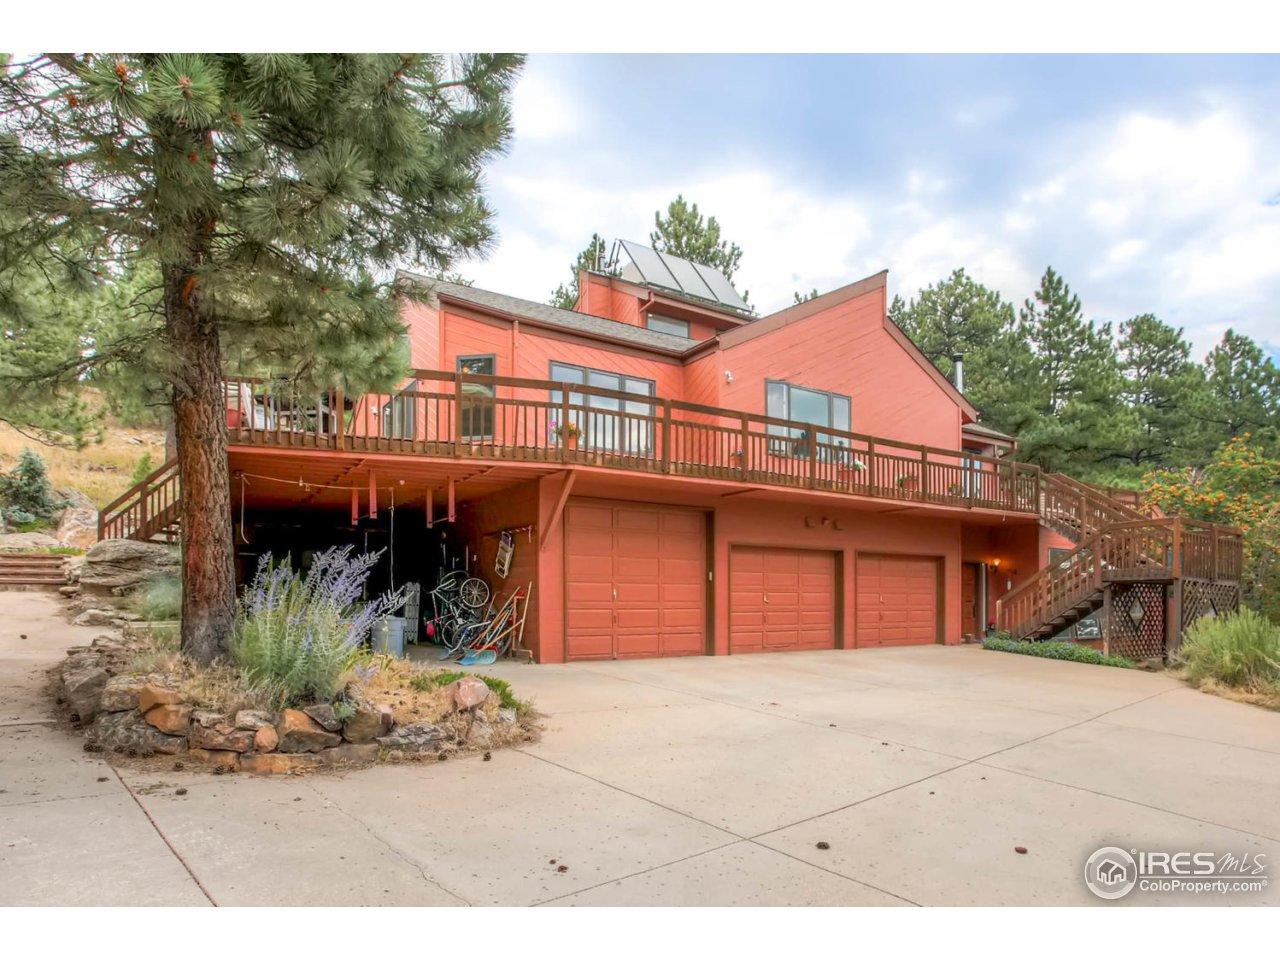 1981 Timber Ln, Boulder CO 80304